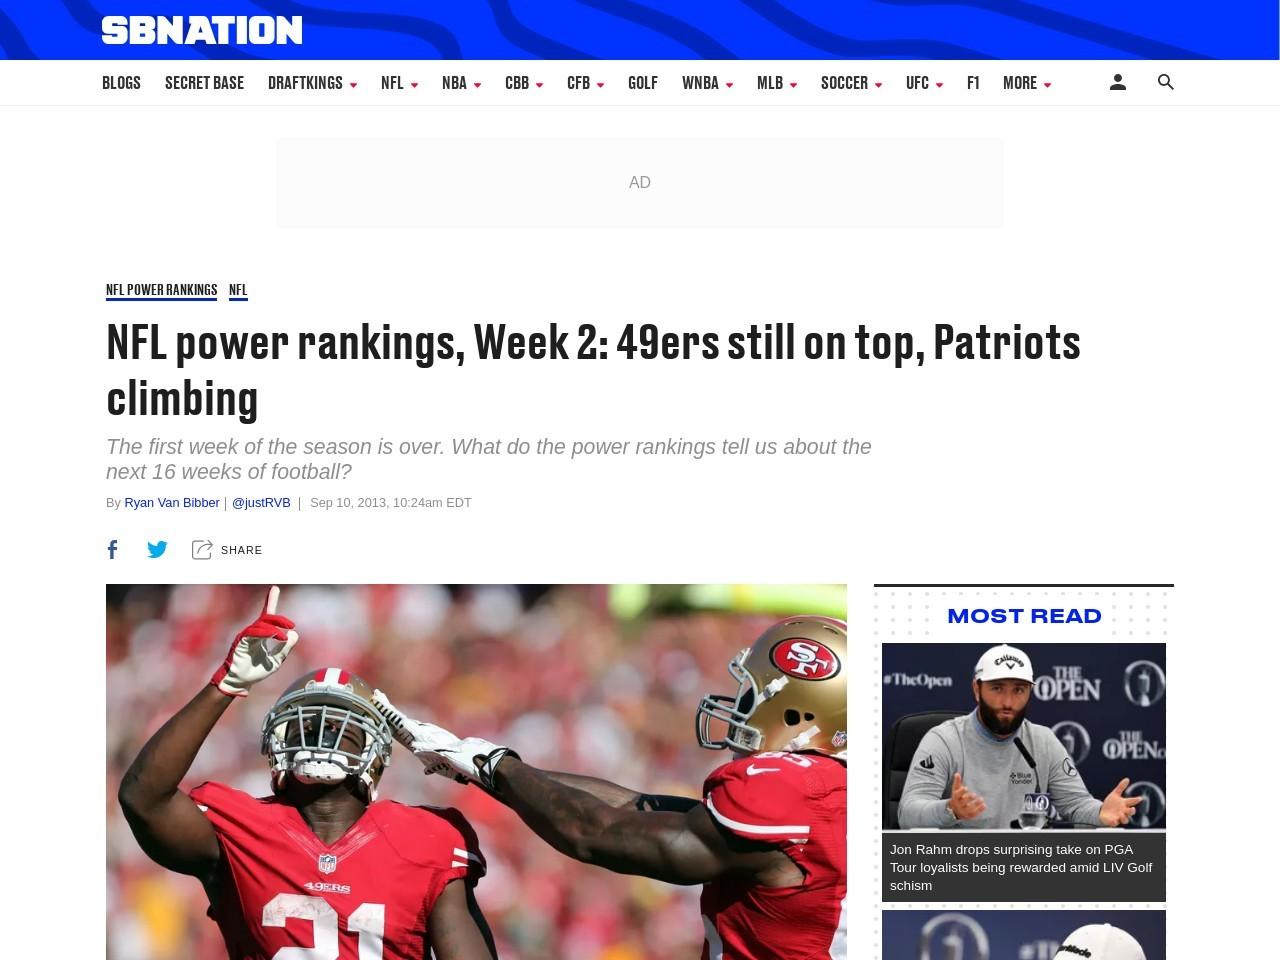 NFL power rankings, Week 2: 49ers still on top, Patriots climbing …